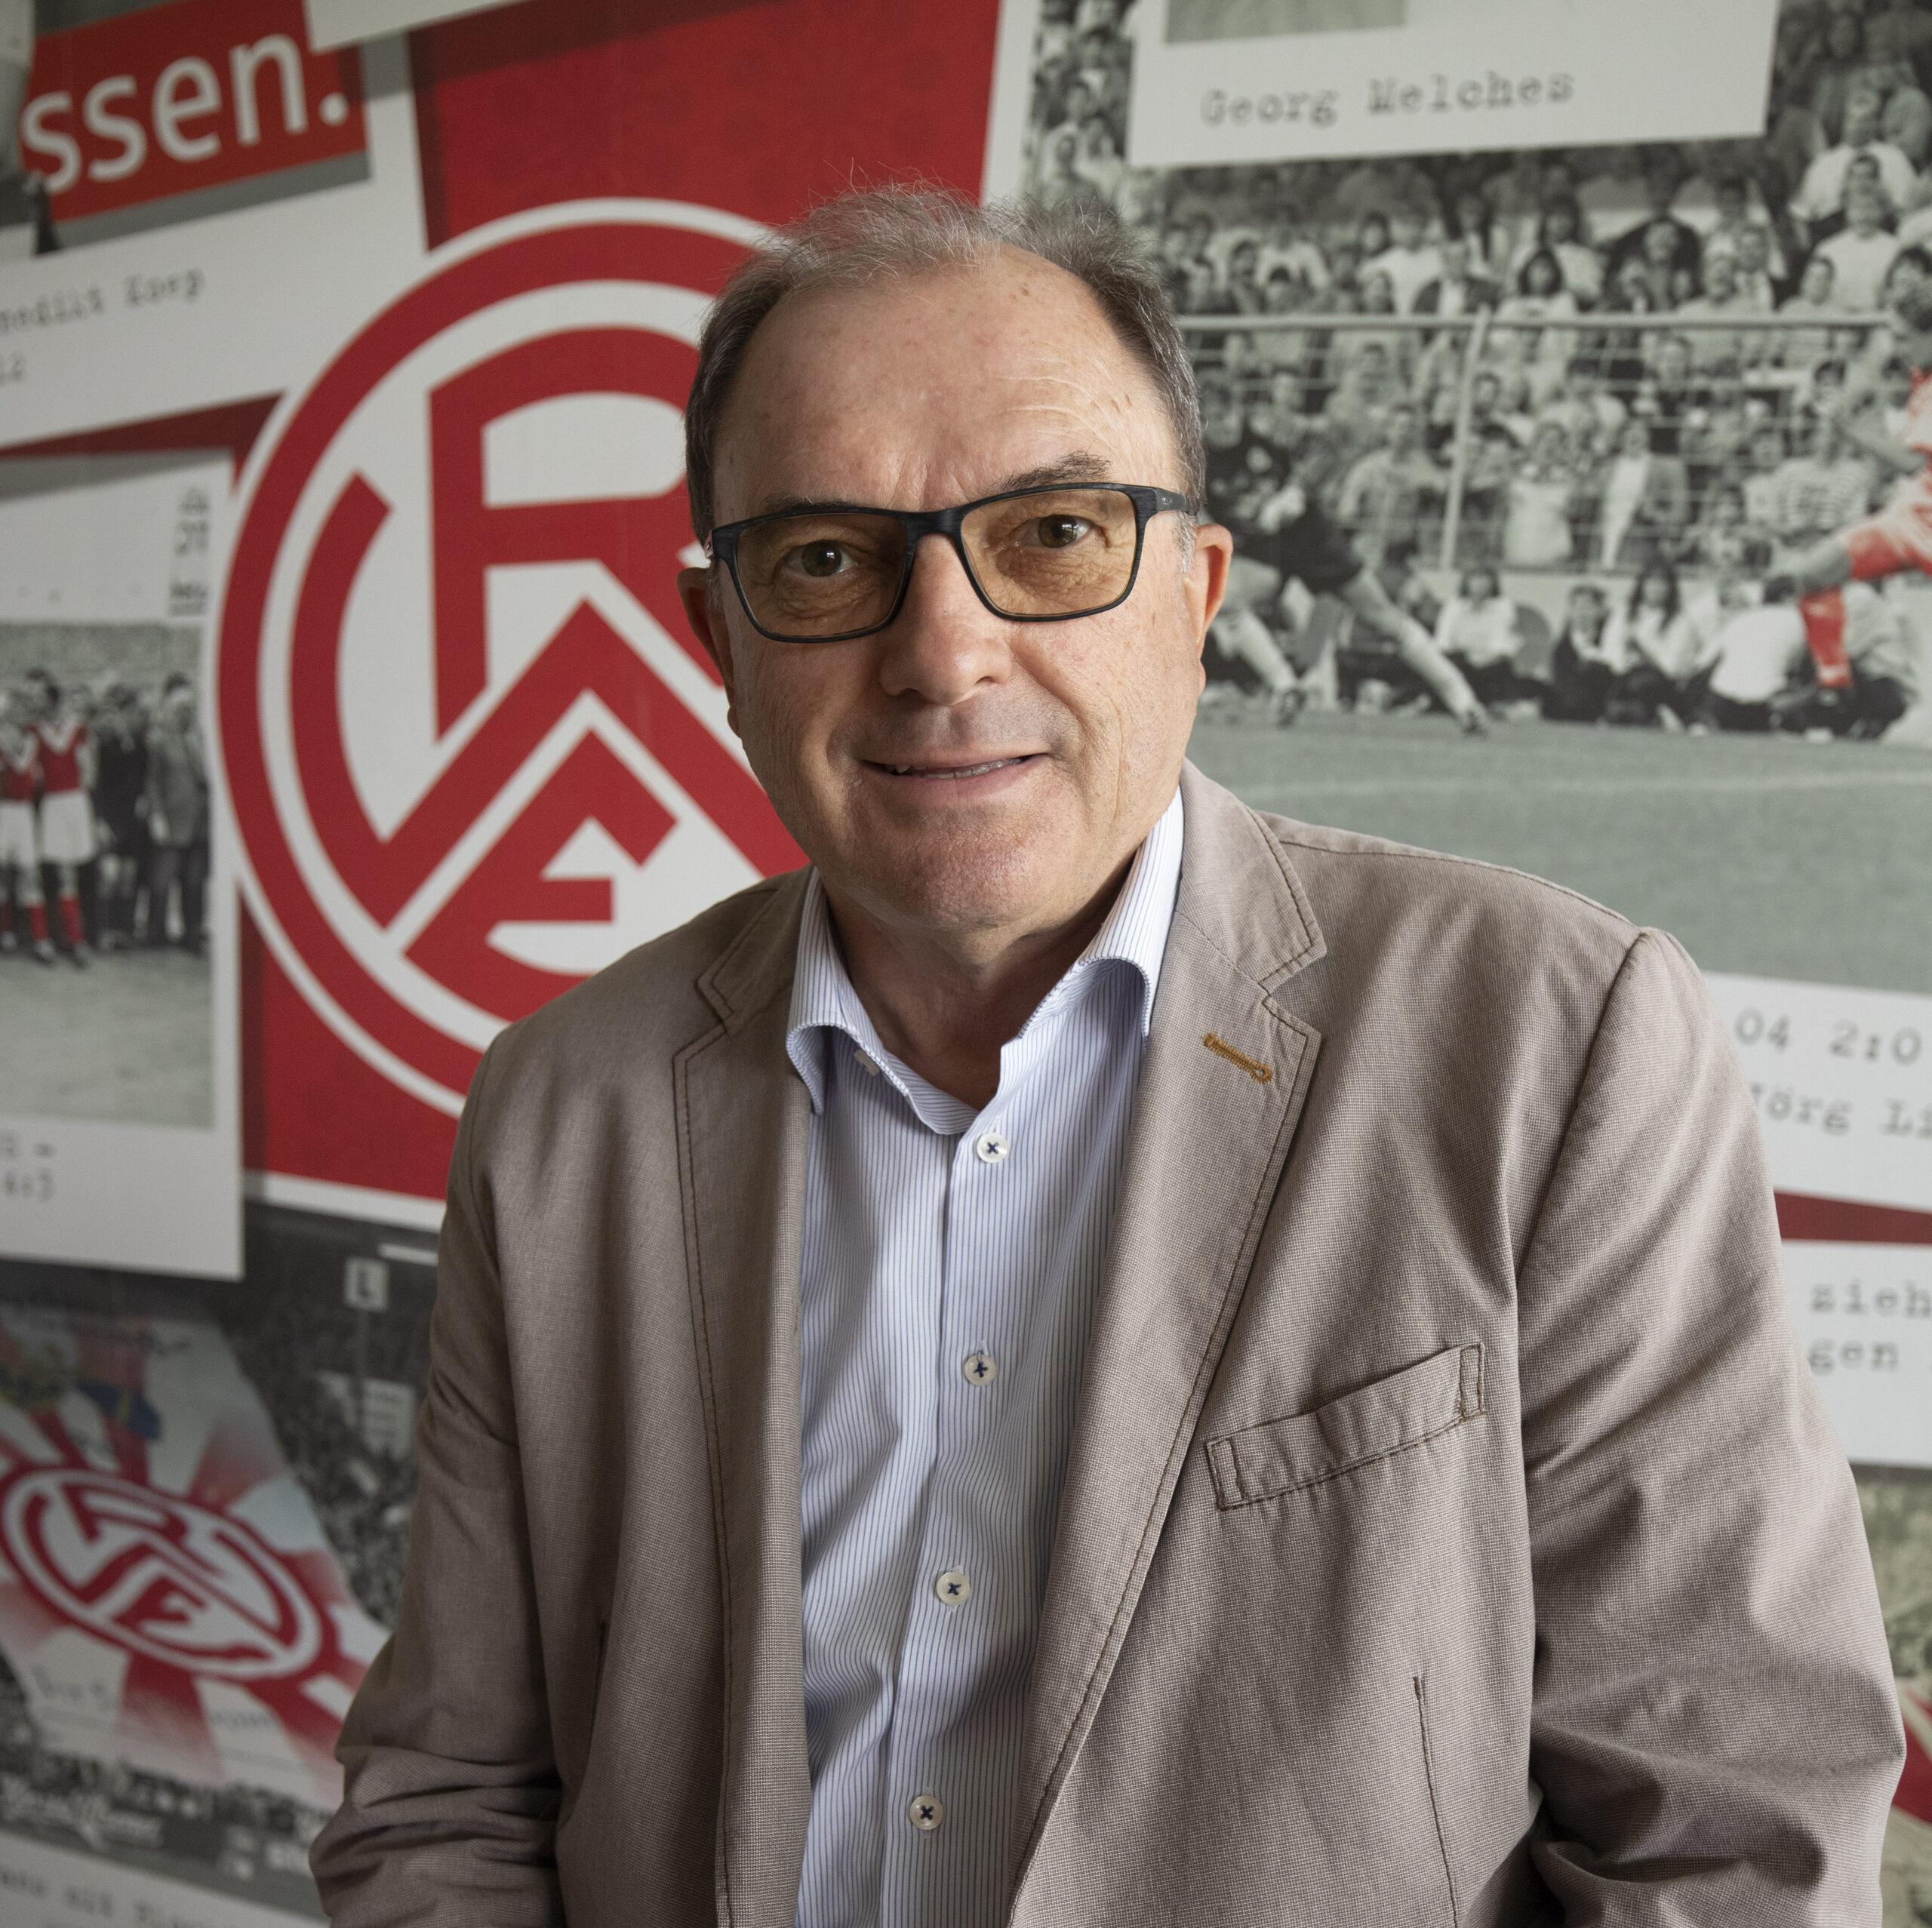 Dieter Gruber – Rot-Weiss Essen